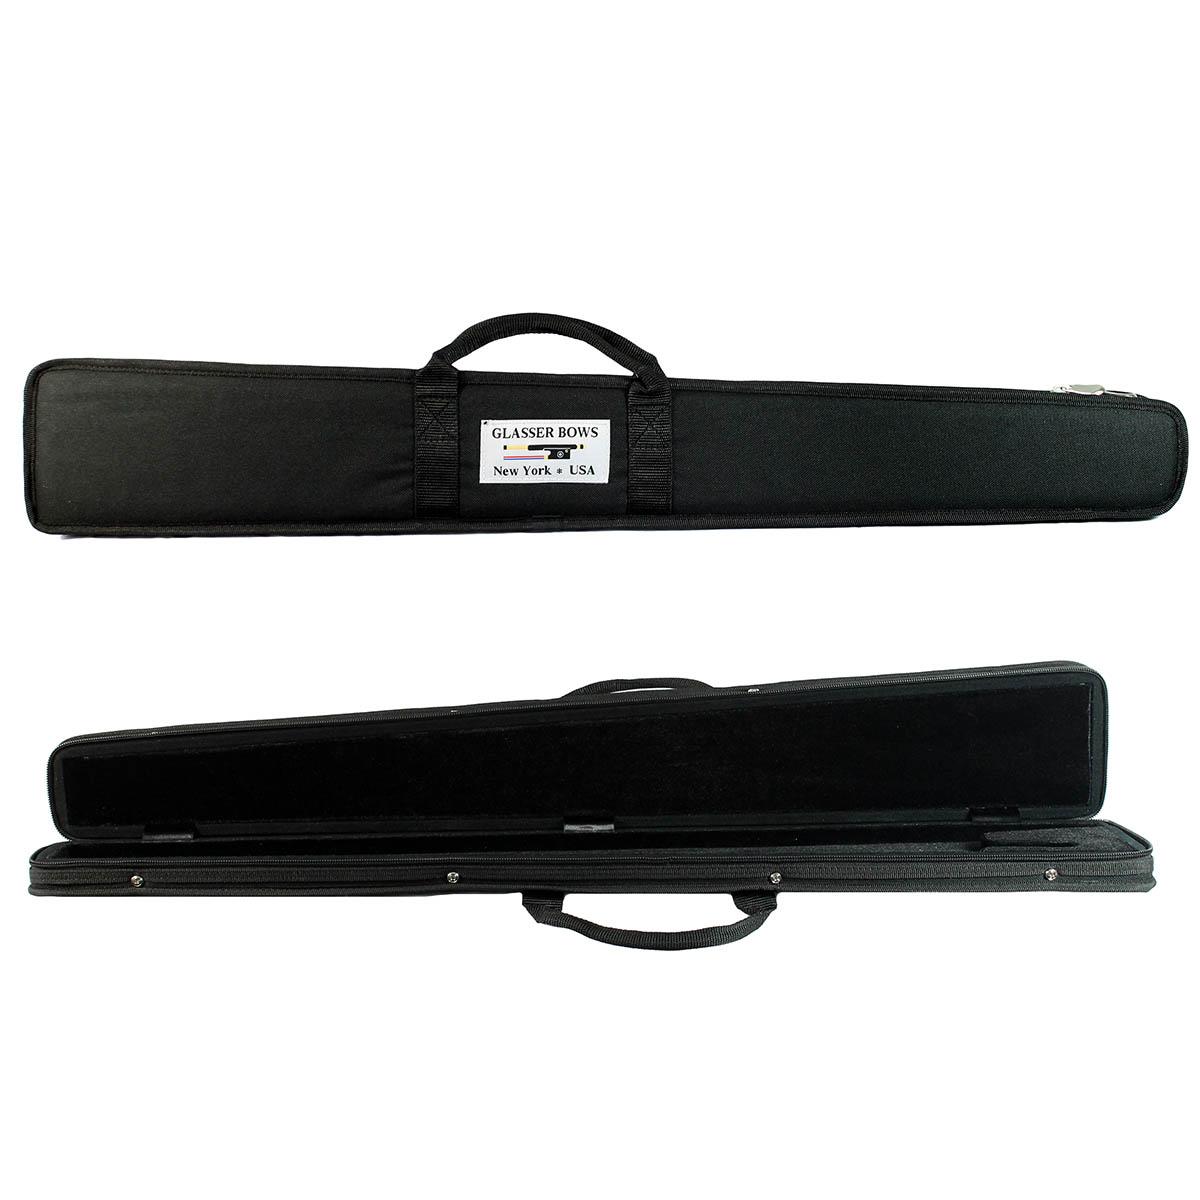 Glasser Bass Bow Case